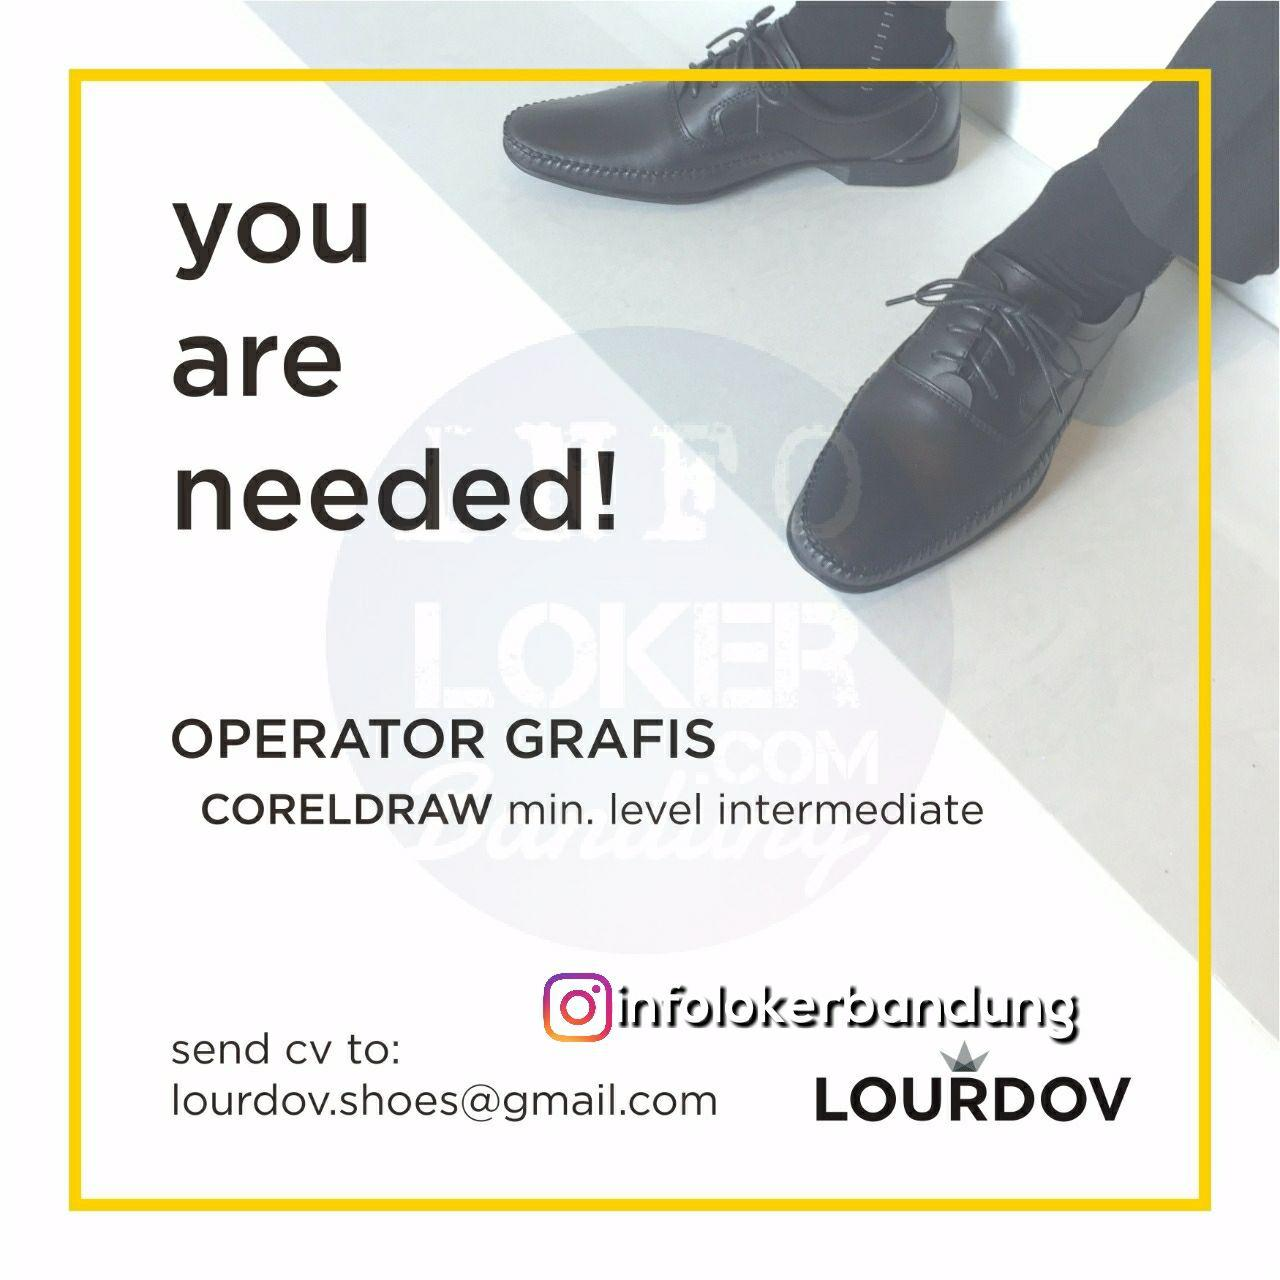 Lowongan Kerja Lourdov Shoes Bandung Maret 2018